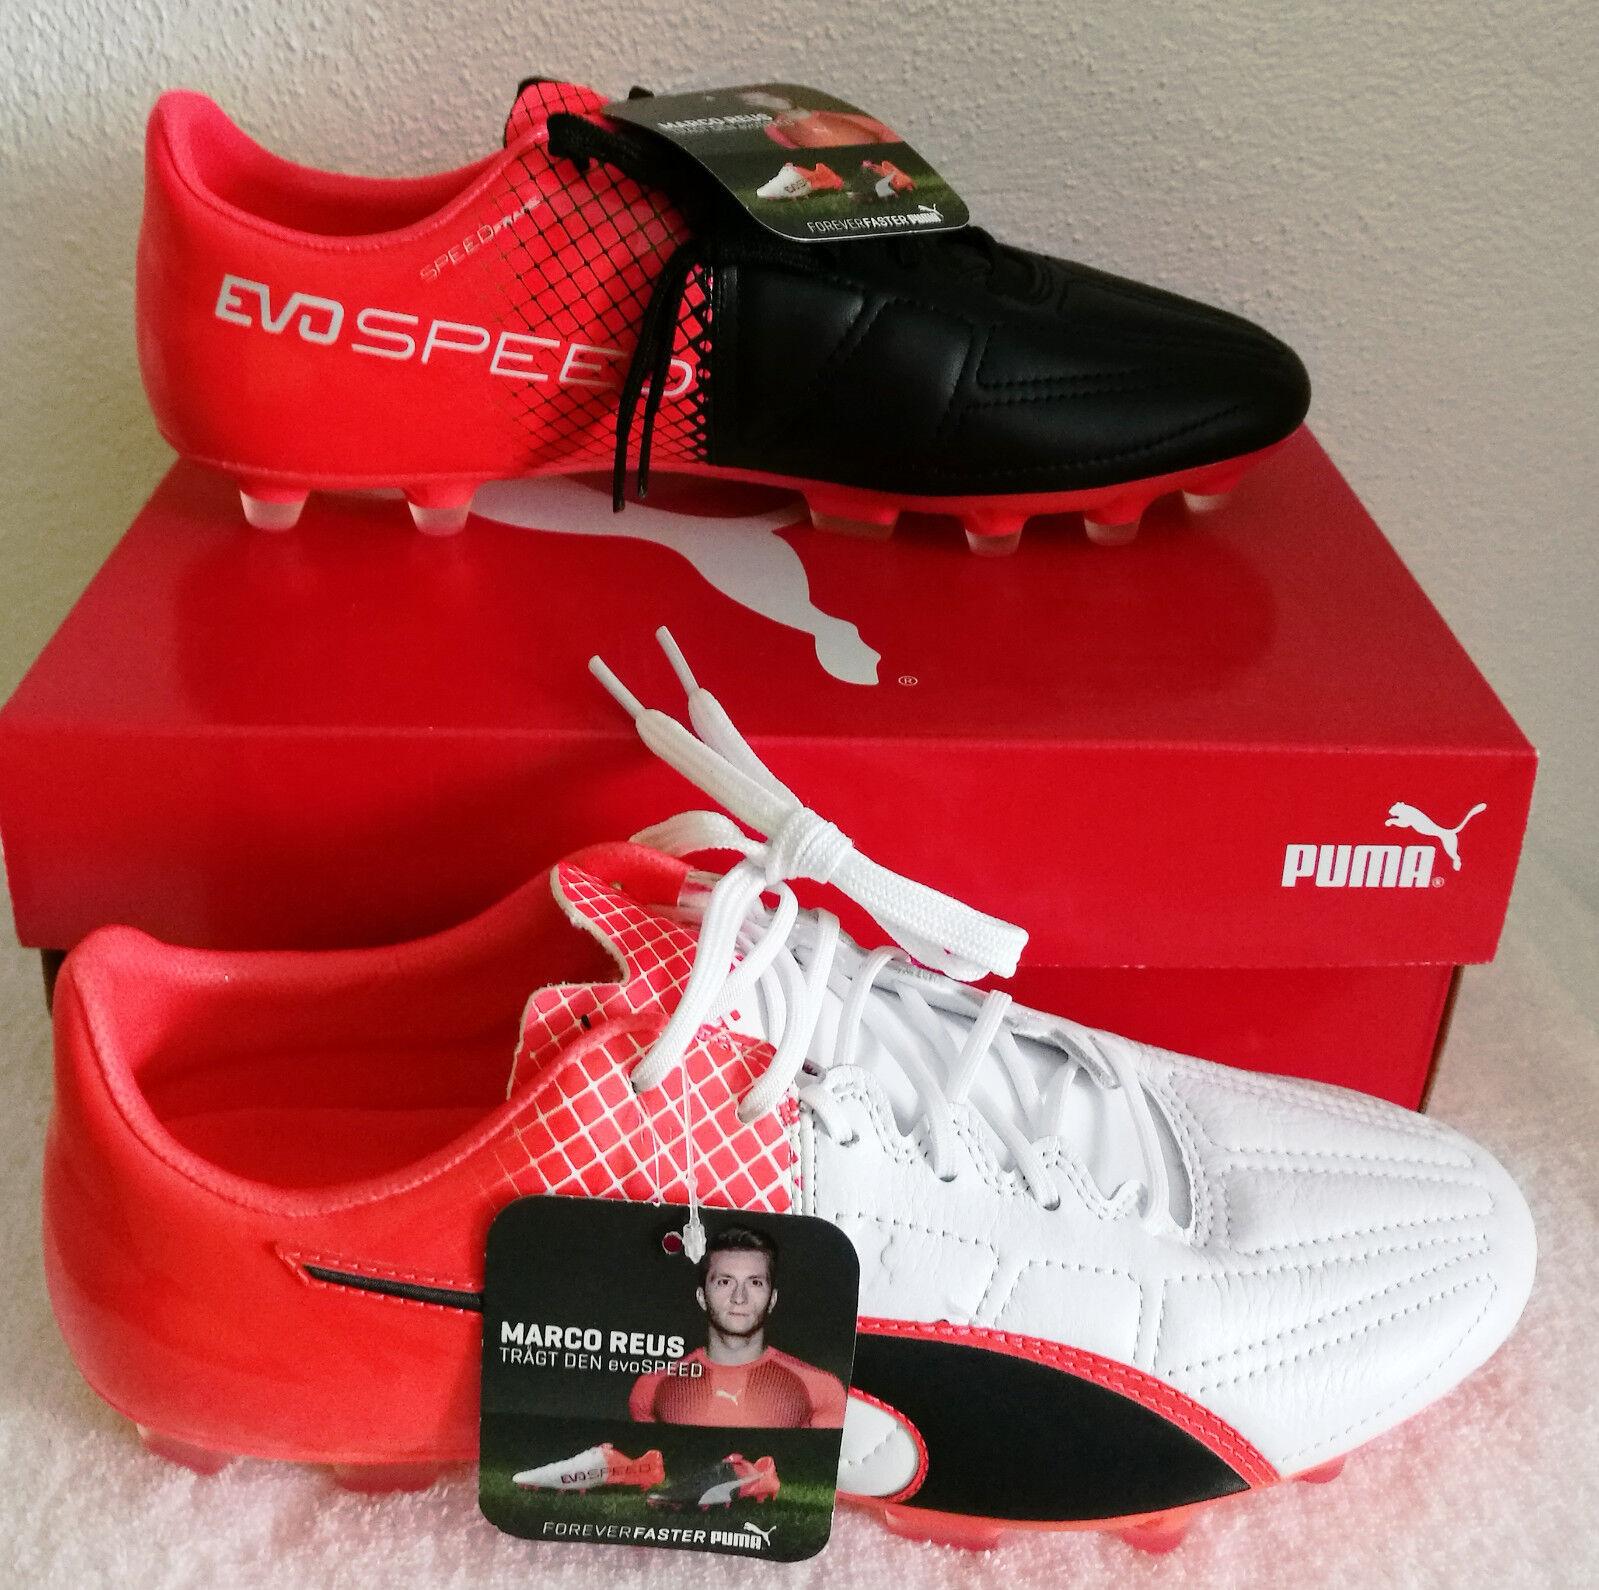 Puma Fußballschuhe Gr.41 evo SPEED 1.5 Lth Lth Lth AG 10383601 Football Soccer 8636df